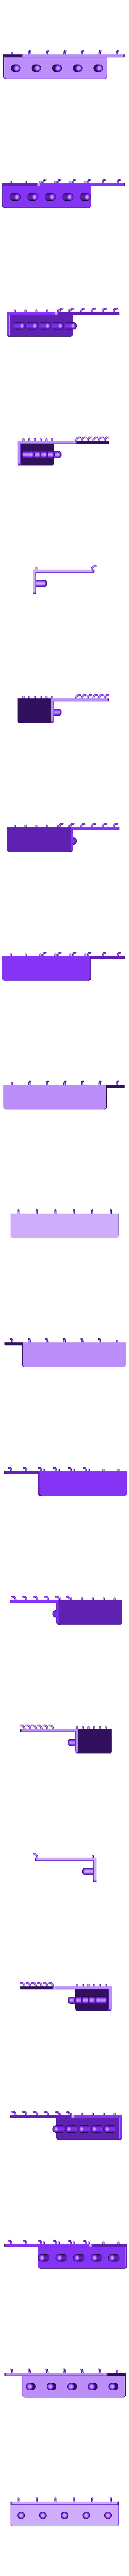 Pins.stl Download free STL file Impact Socket Holder Set 5pcs 1/2 Inch 017 I for screws or peg board • 3D printing template, Wiesemann1893